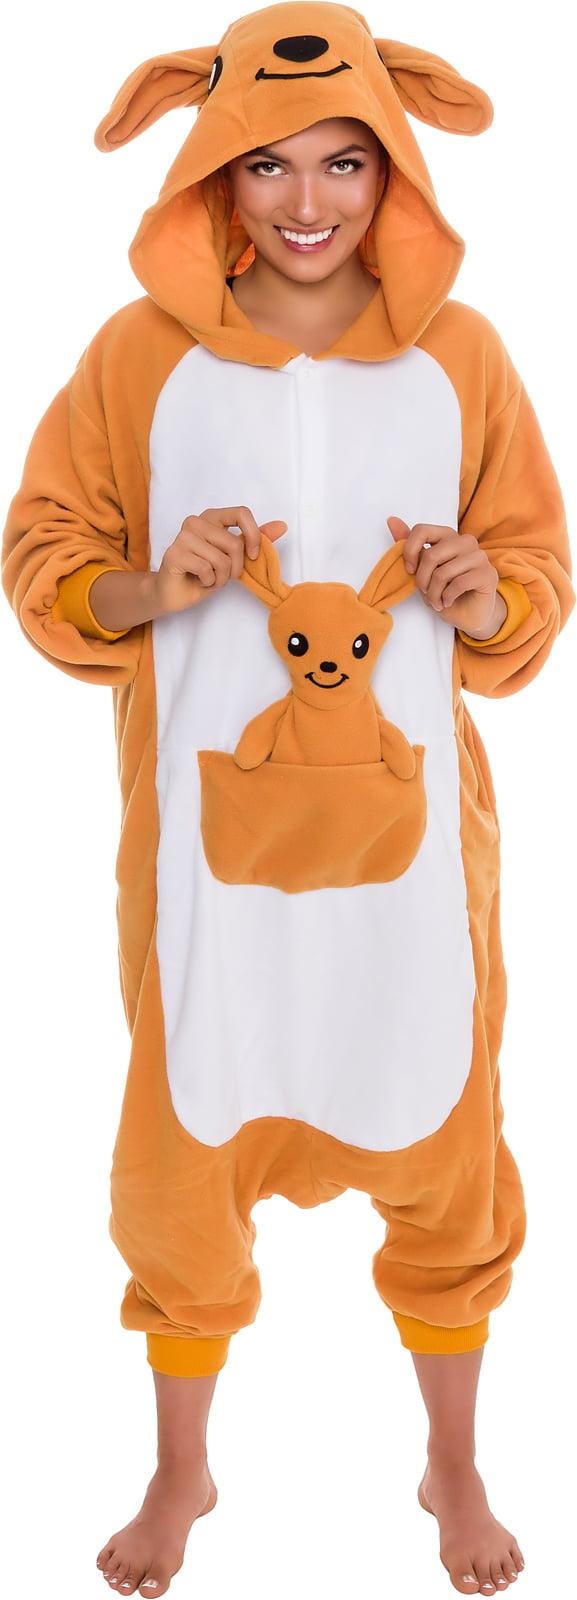 SILVER LILLY Unisex Adult Plush Animal Cosplay Costume Pajamas (Kangaroo) by Silver Lilly